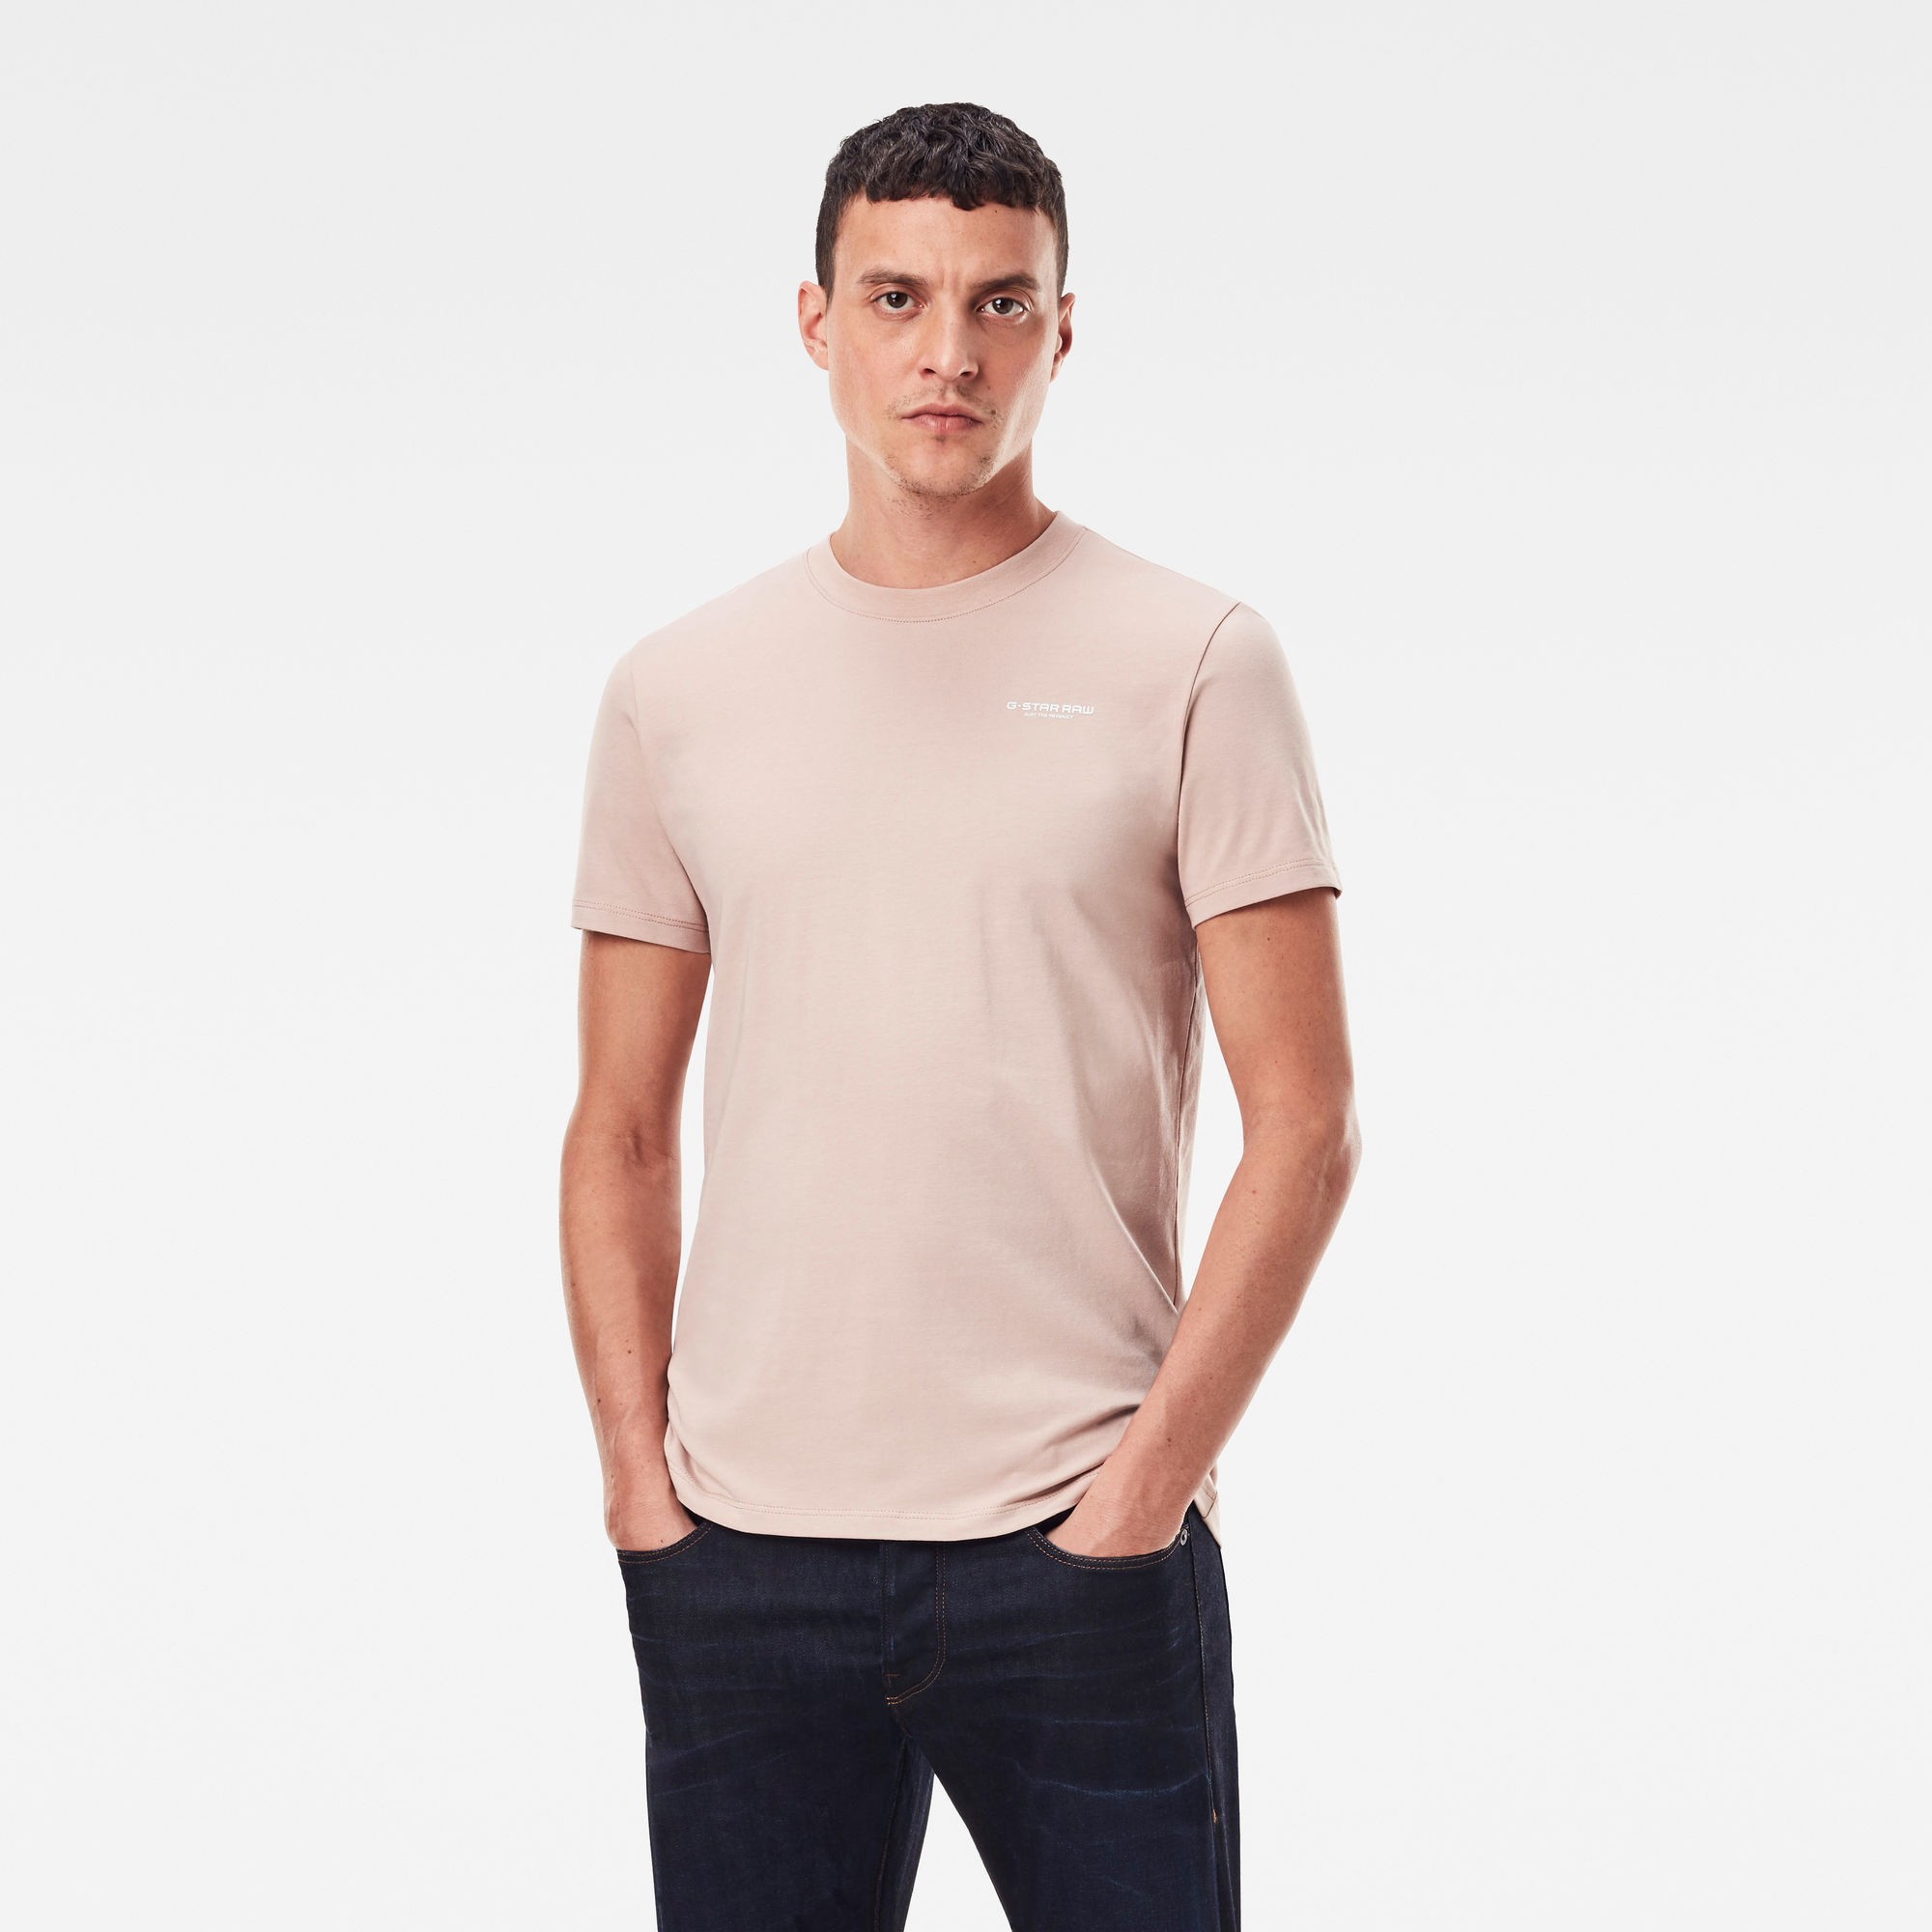 G-Star RAW Heren Slim Base T-Shirt Roze